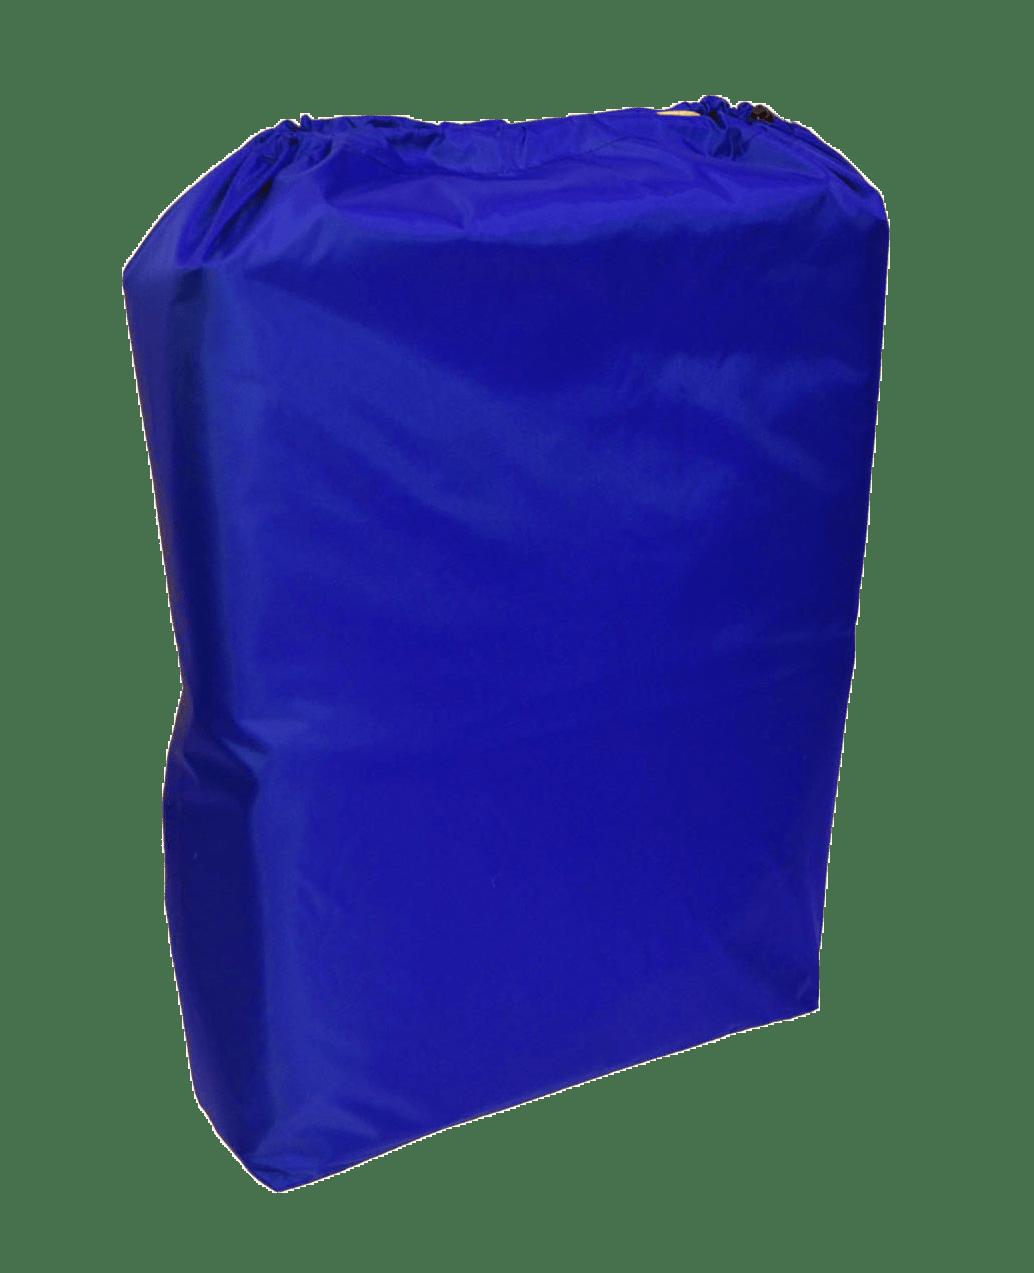 Awning Groundsheet Bag Waterproof Material Bags4everything